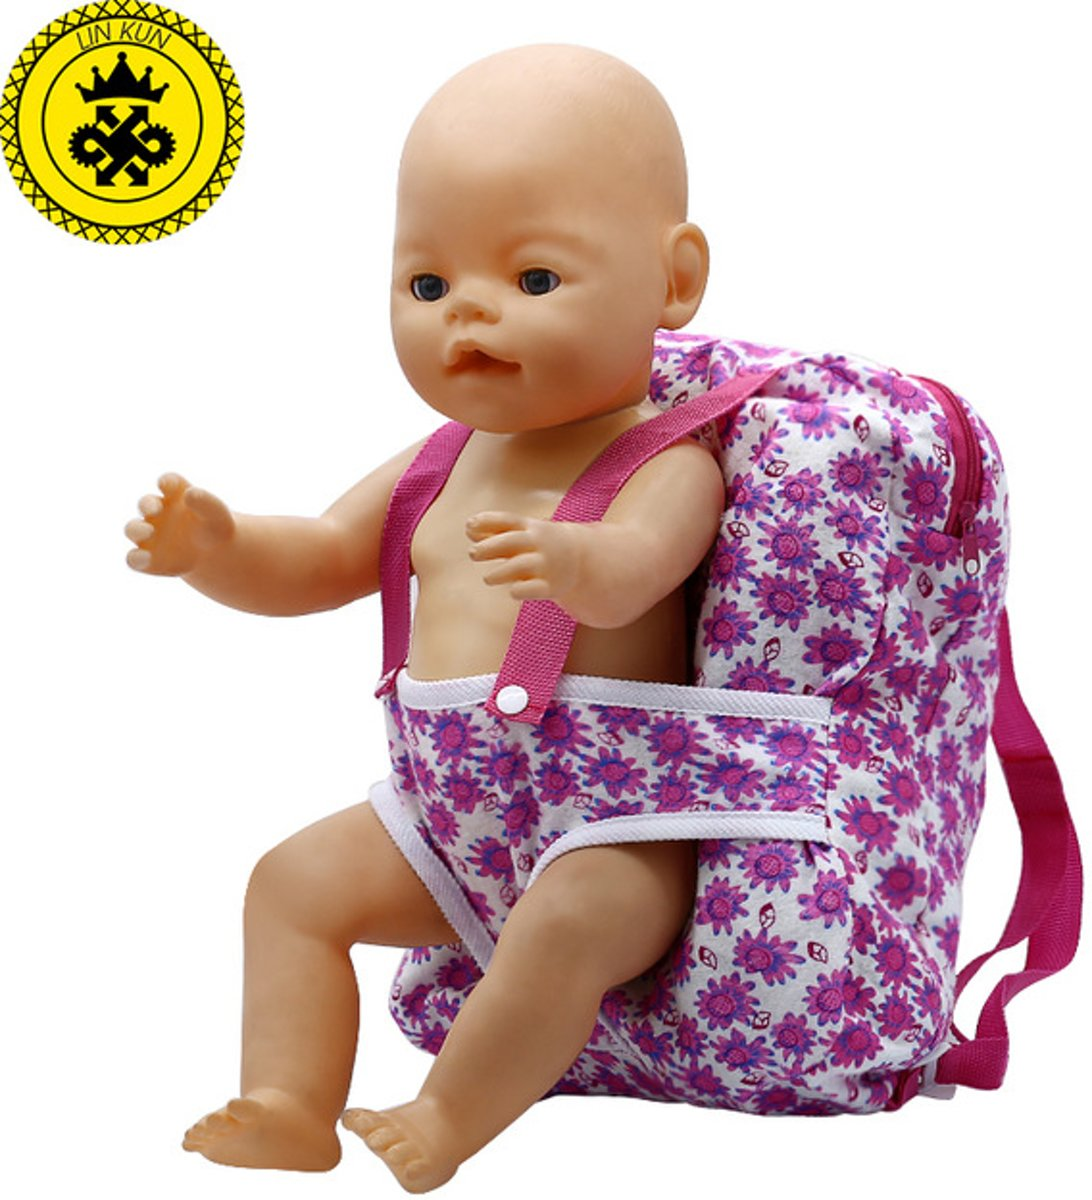 B-Merk Baby Born rugzak, draagtas, roze